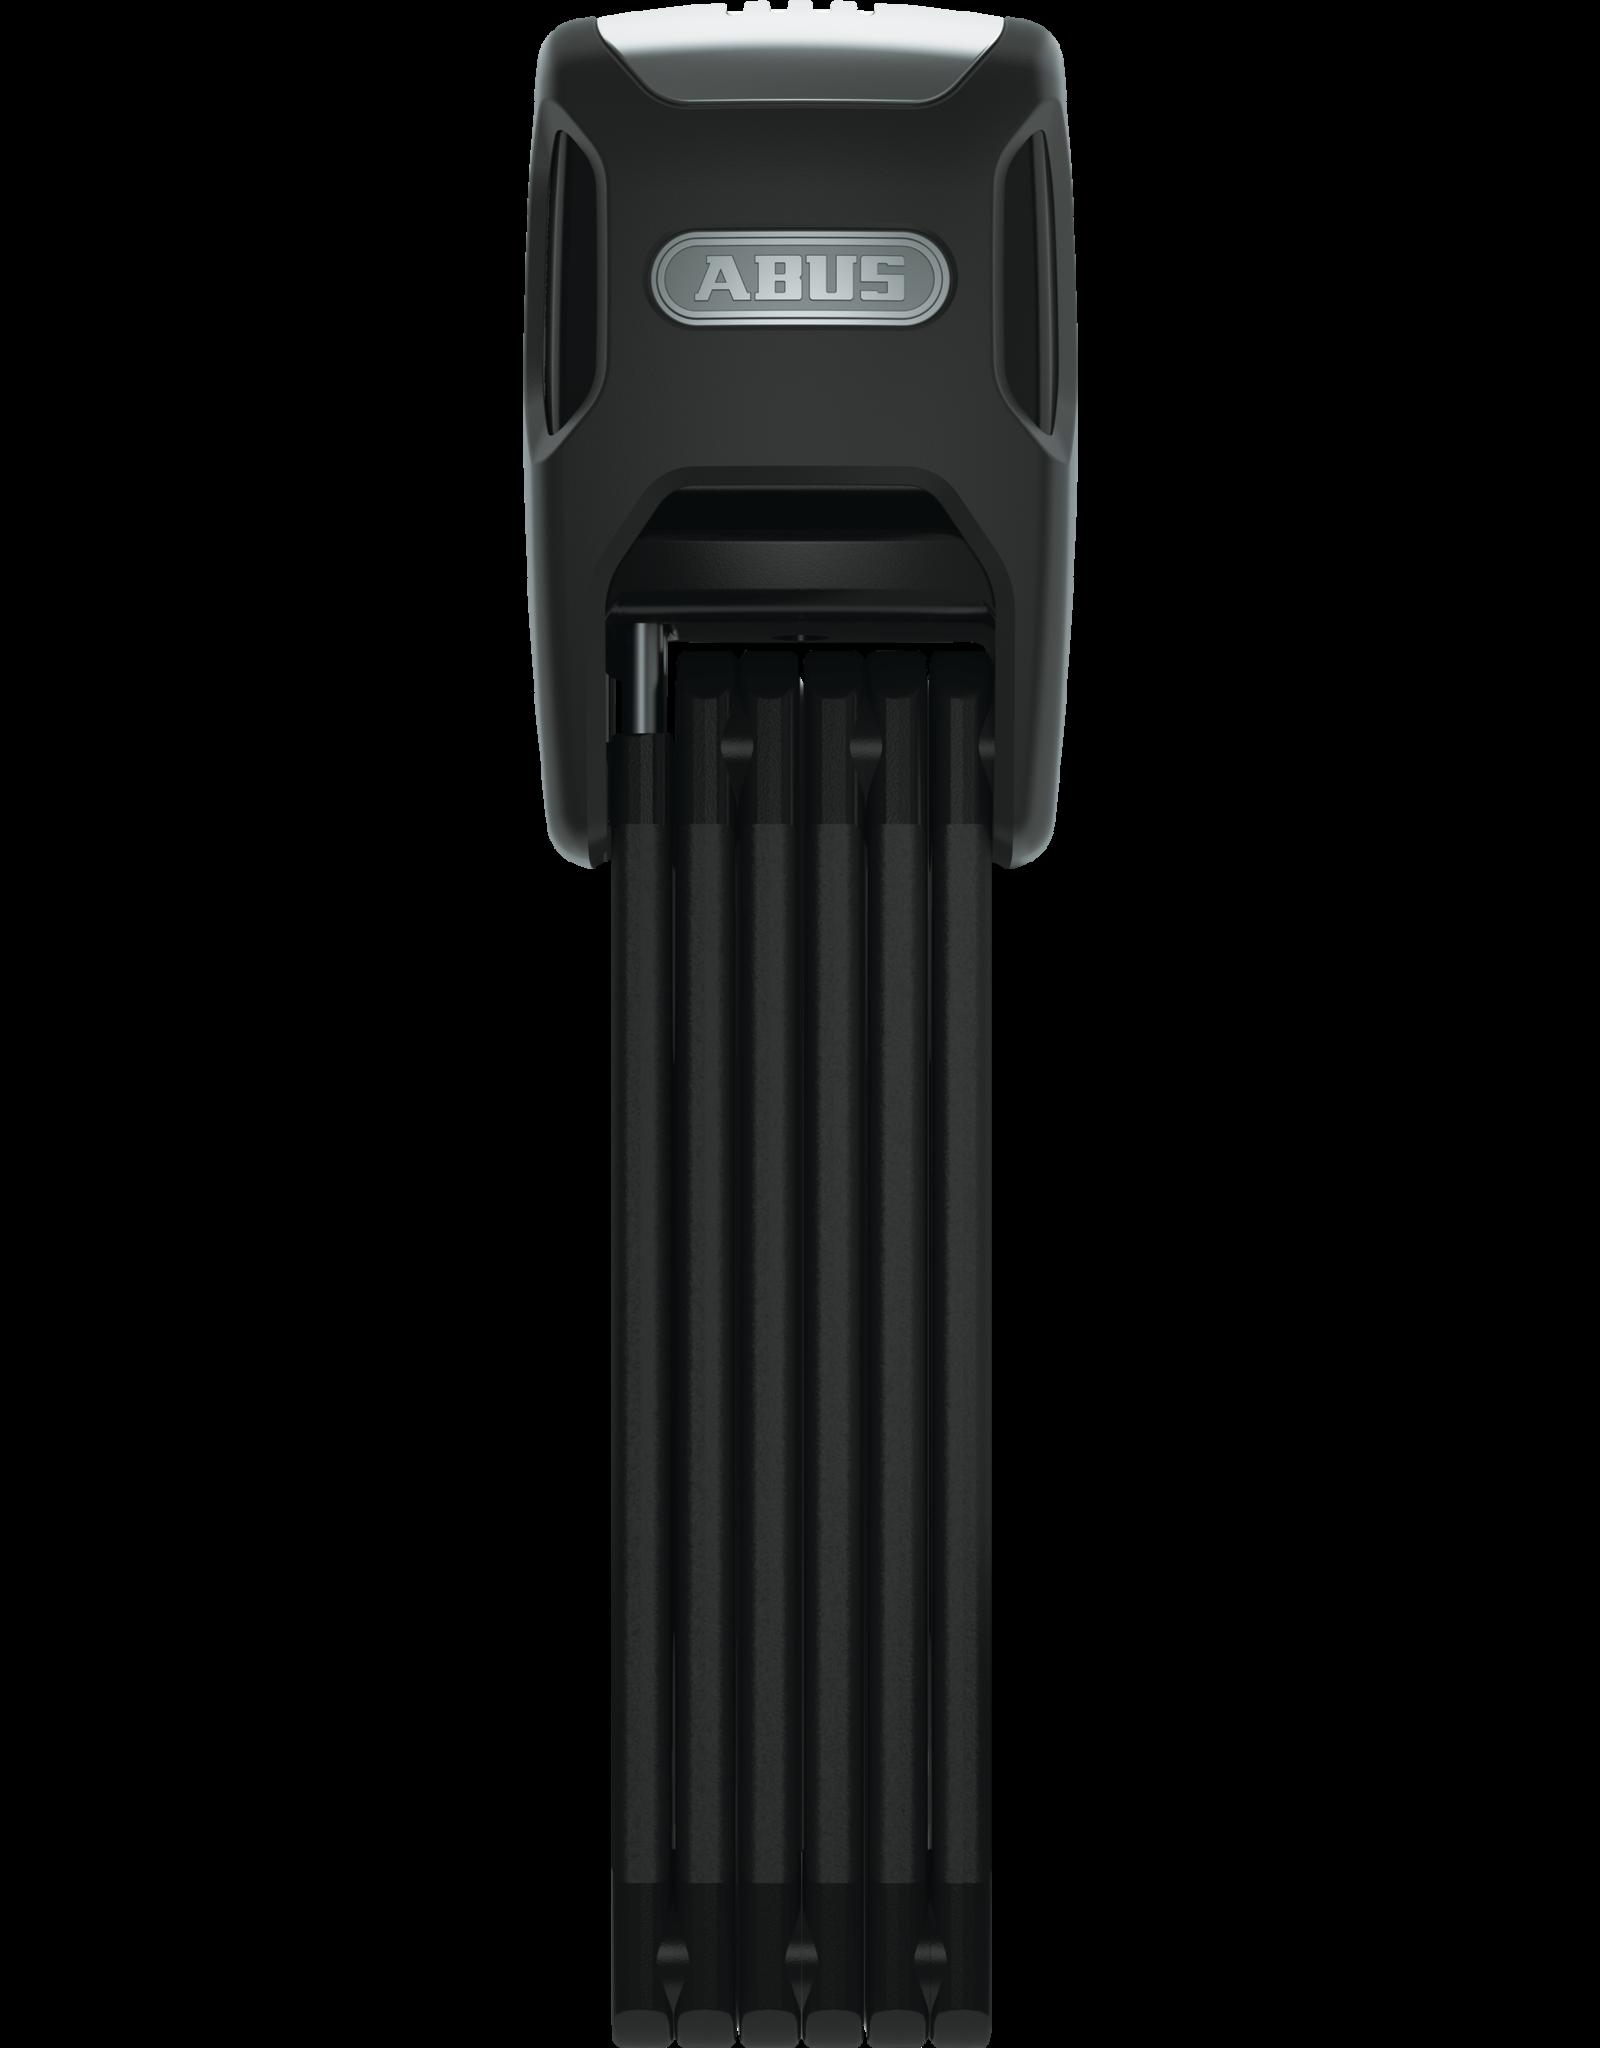 Abus Abus, Bordo Alarm 6000, Foldable lock w/ key lock, 5mm x 90cm (5mm x 3'), SH Bracket, Black